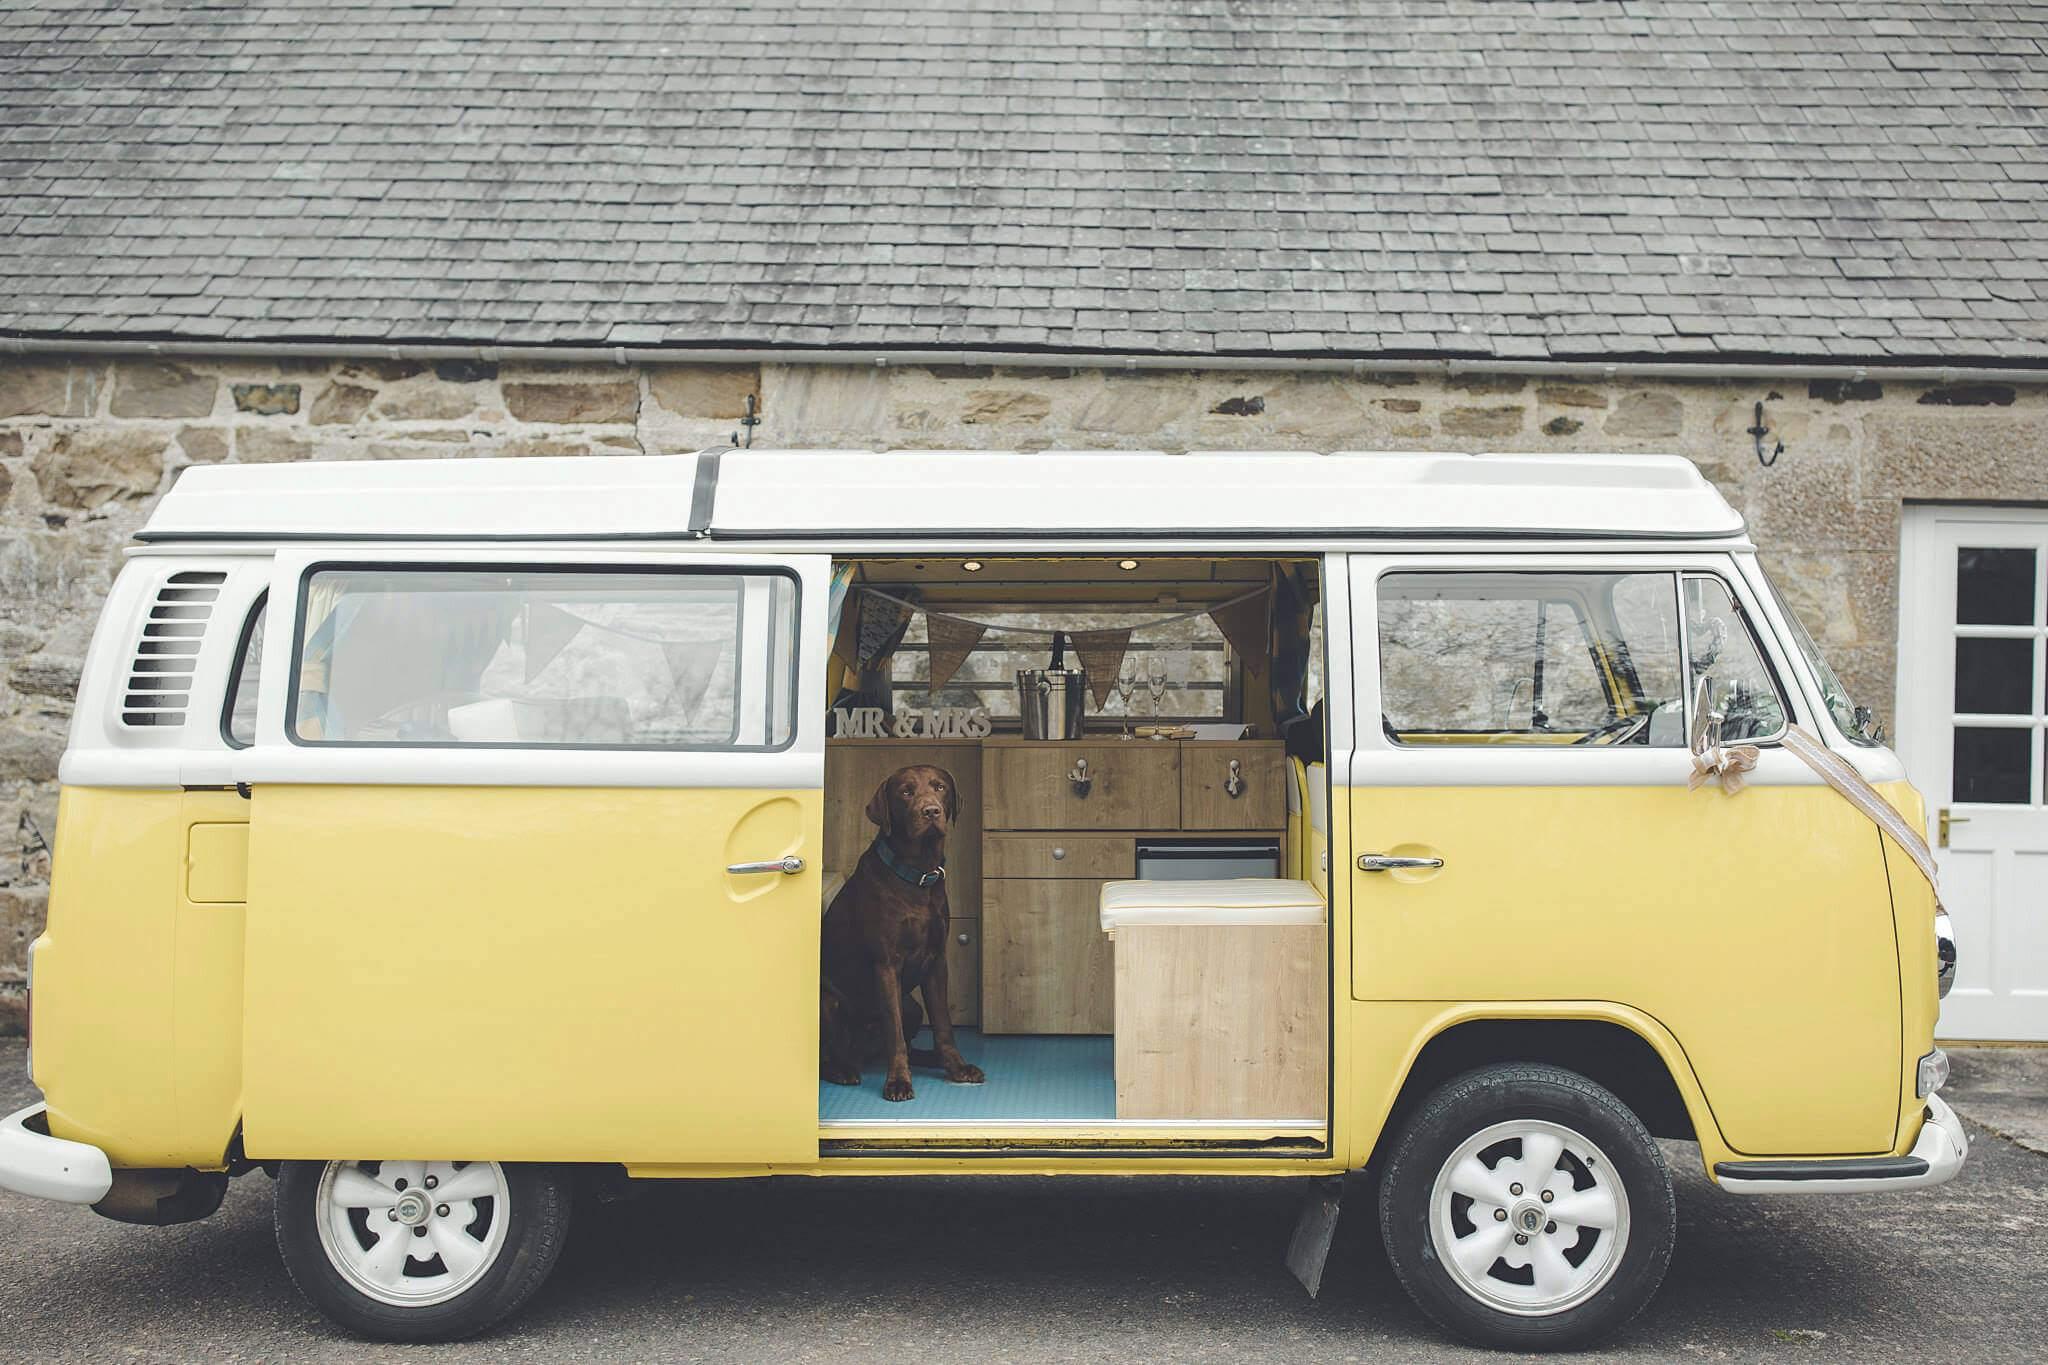 VW-camper-wedding-car-little-miss-sunshine-4.jpg